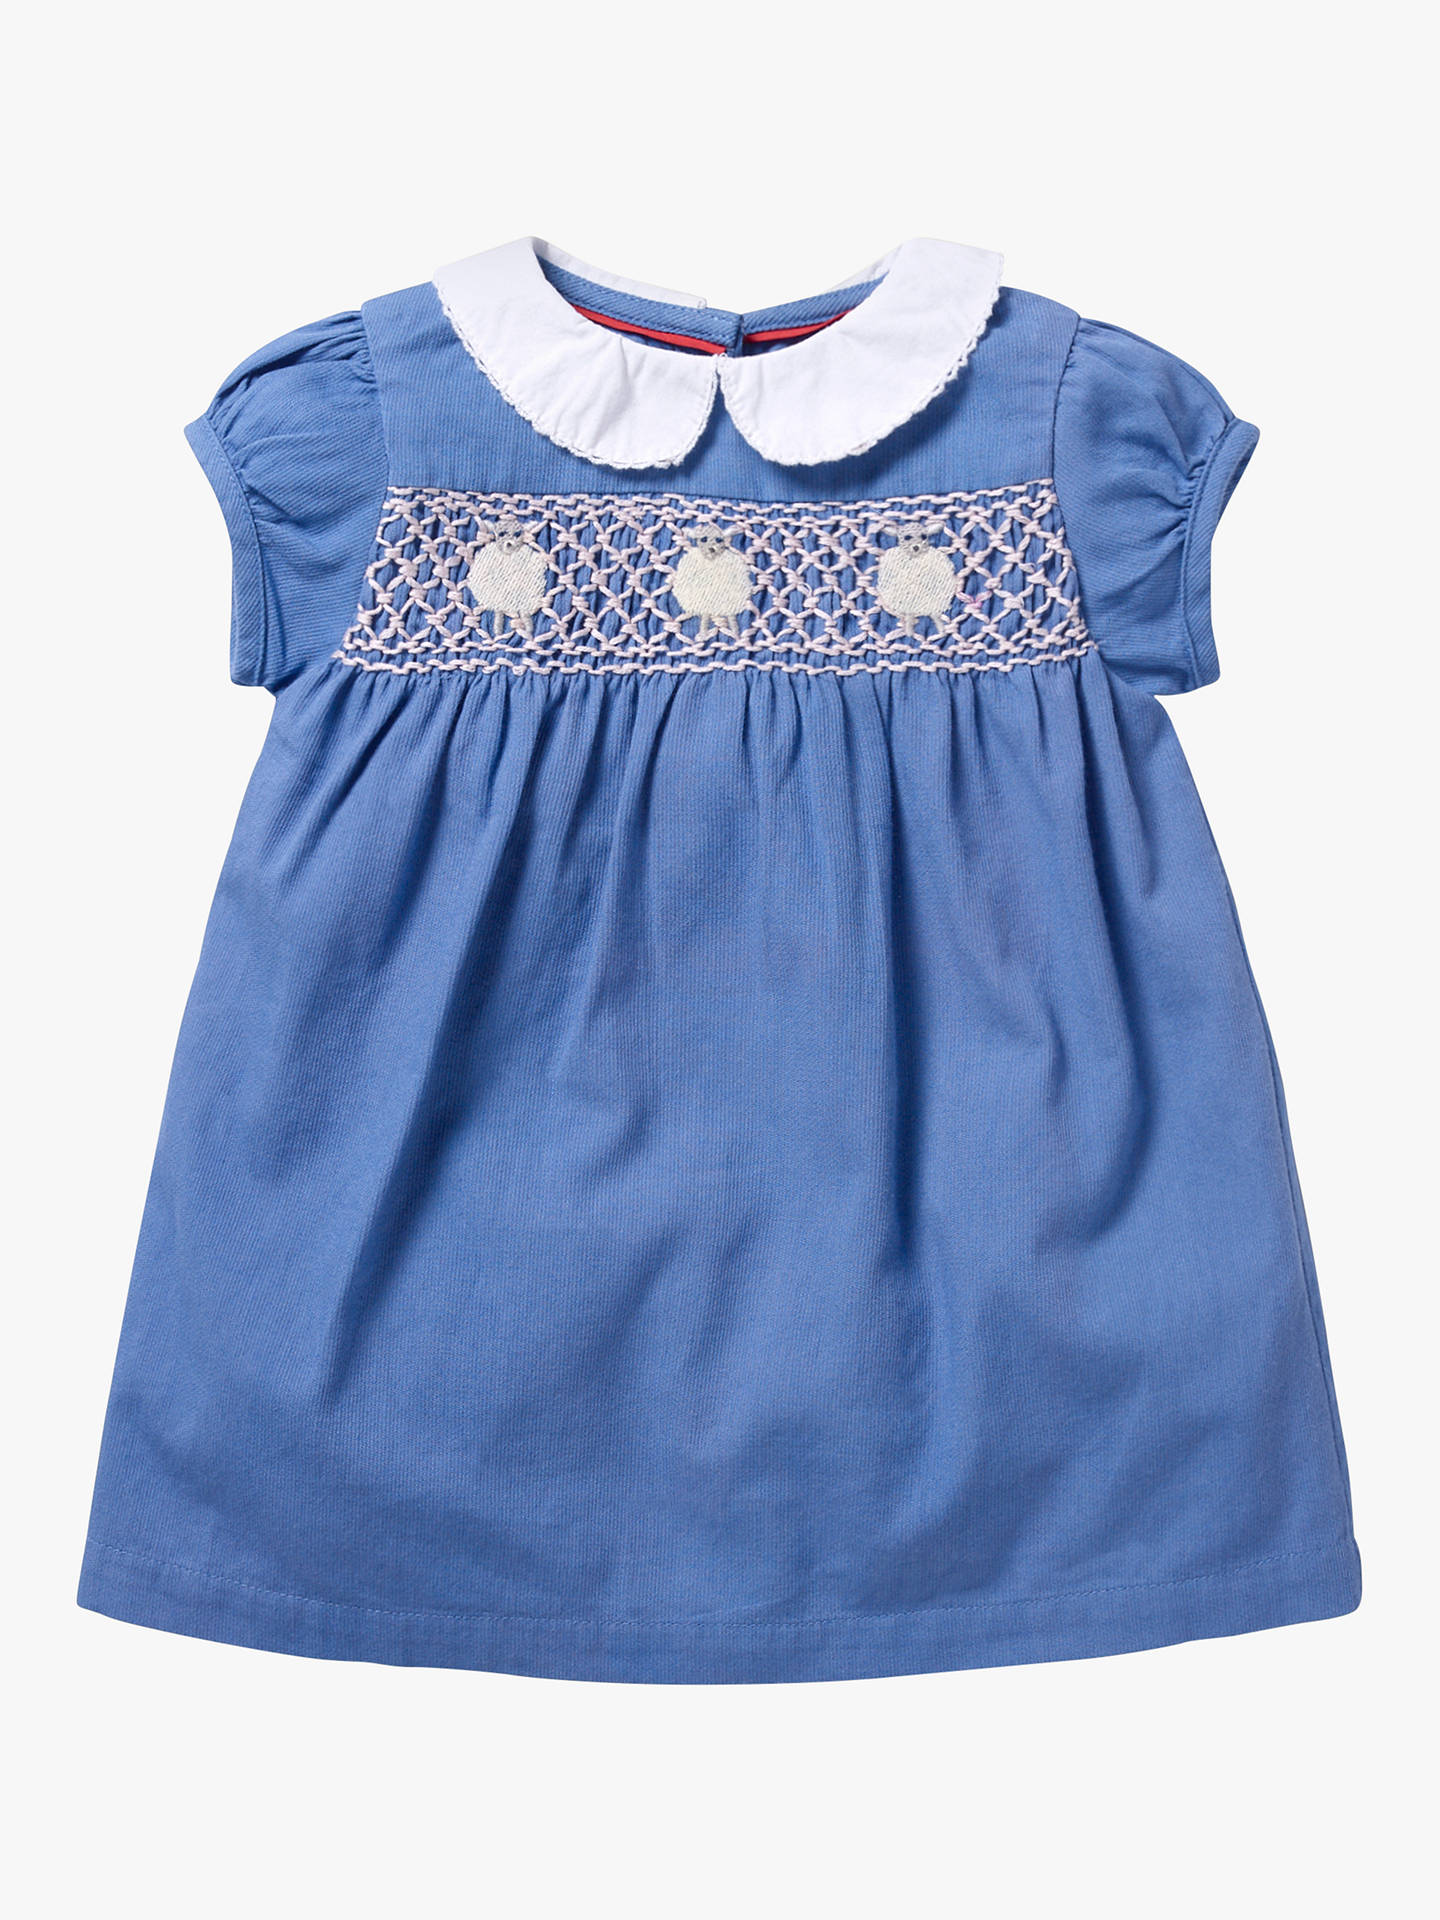 05a55140919a2 Mini Boden Baby Smock Dress, Elizabethan Blue at John Lewis & Partners